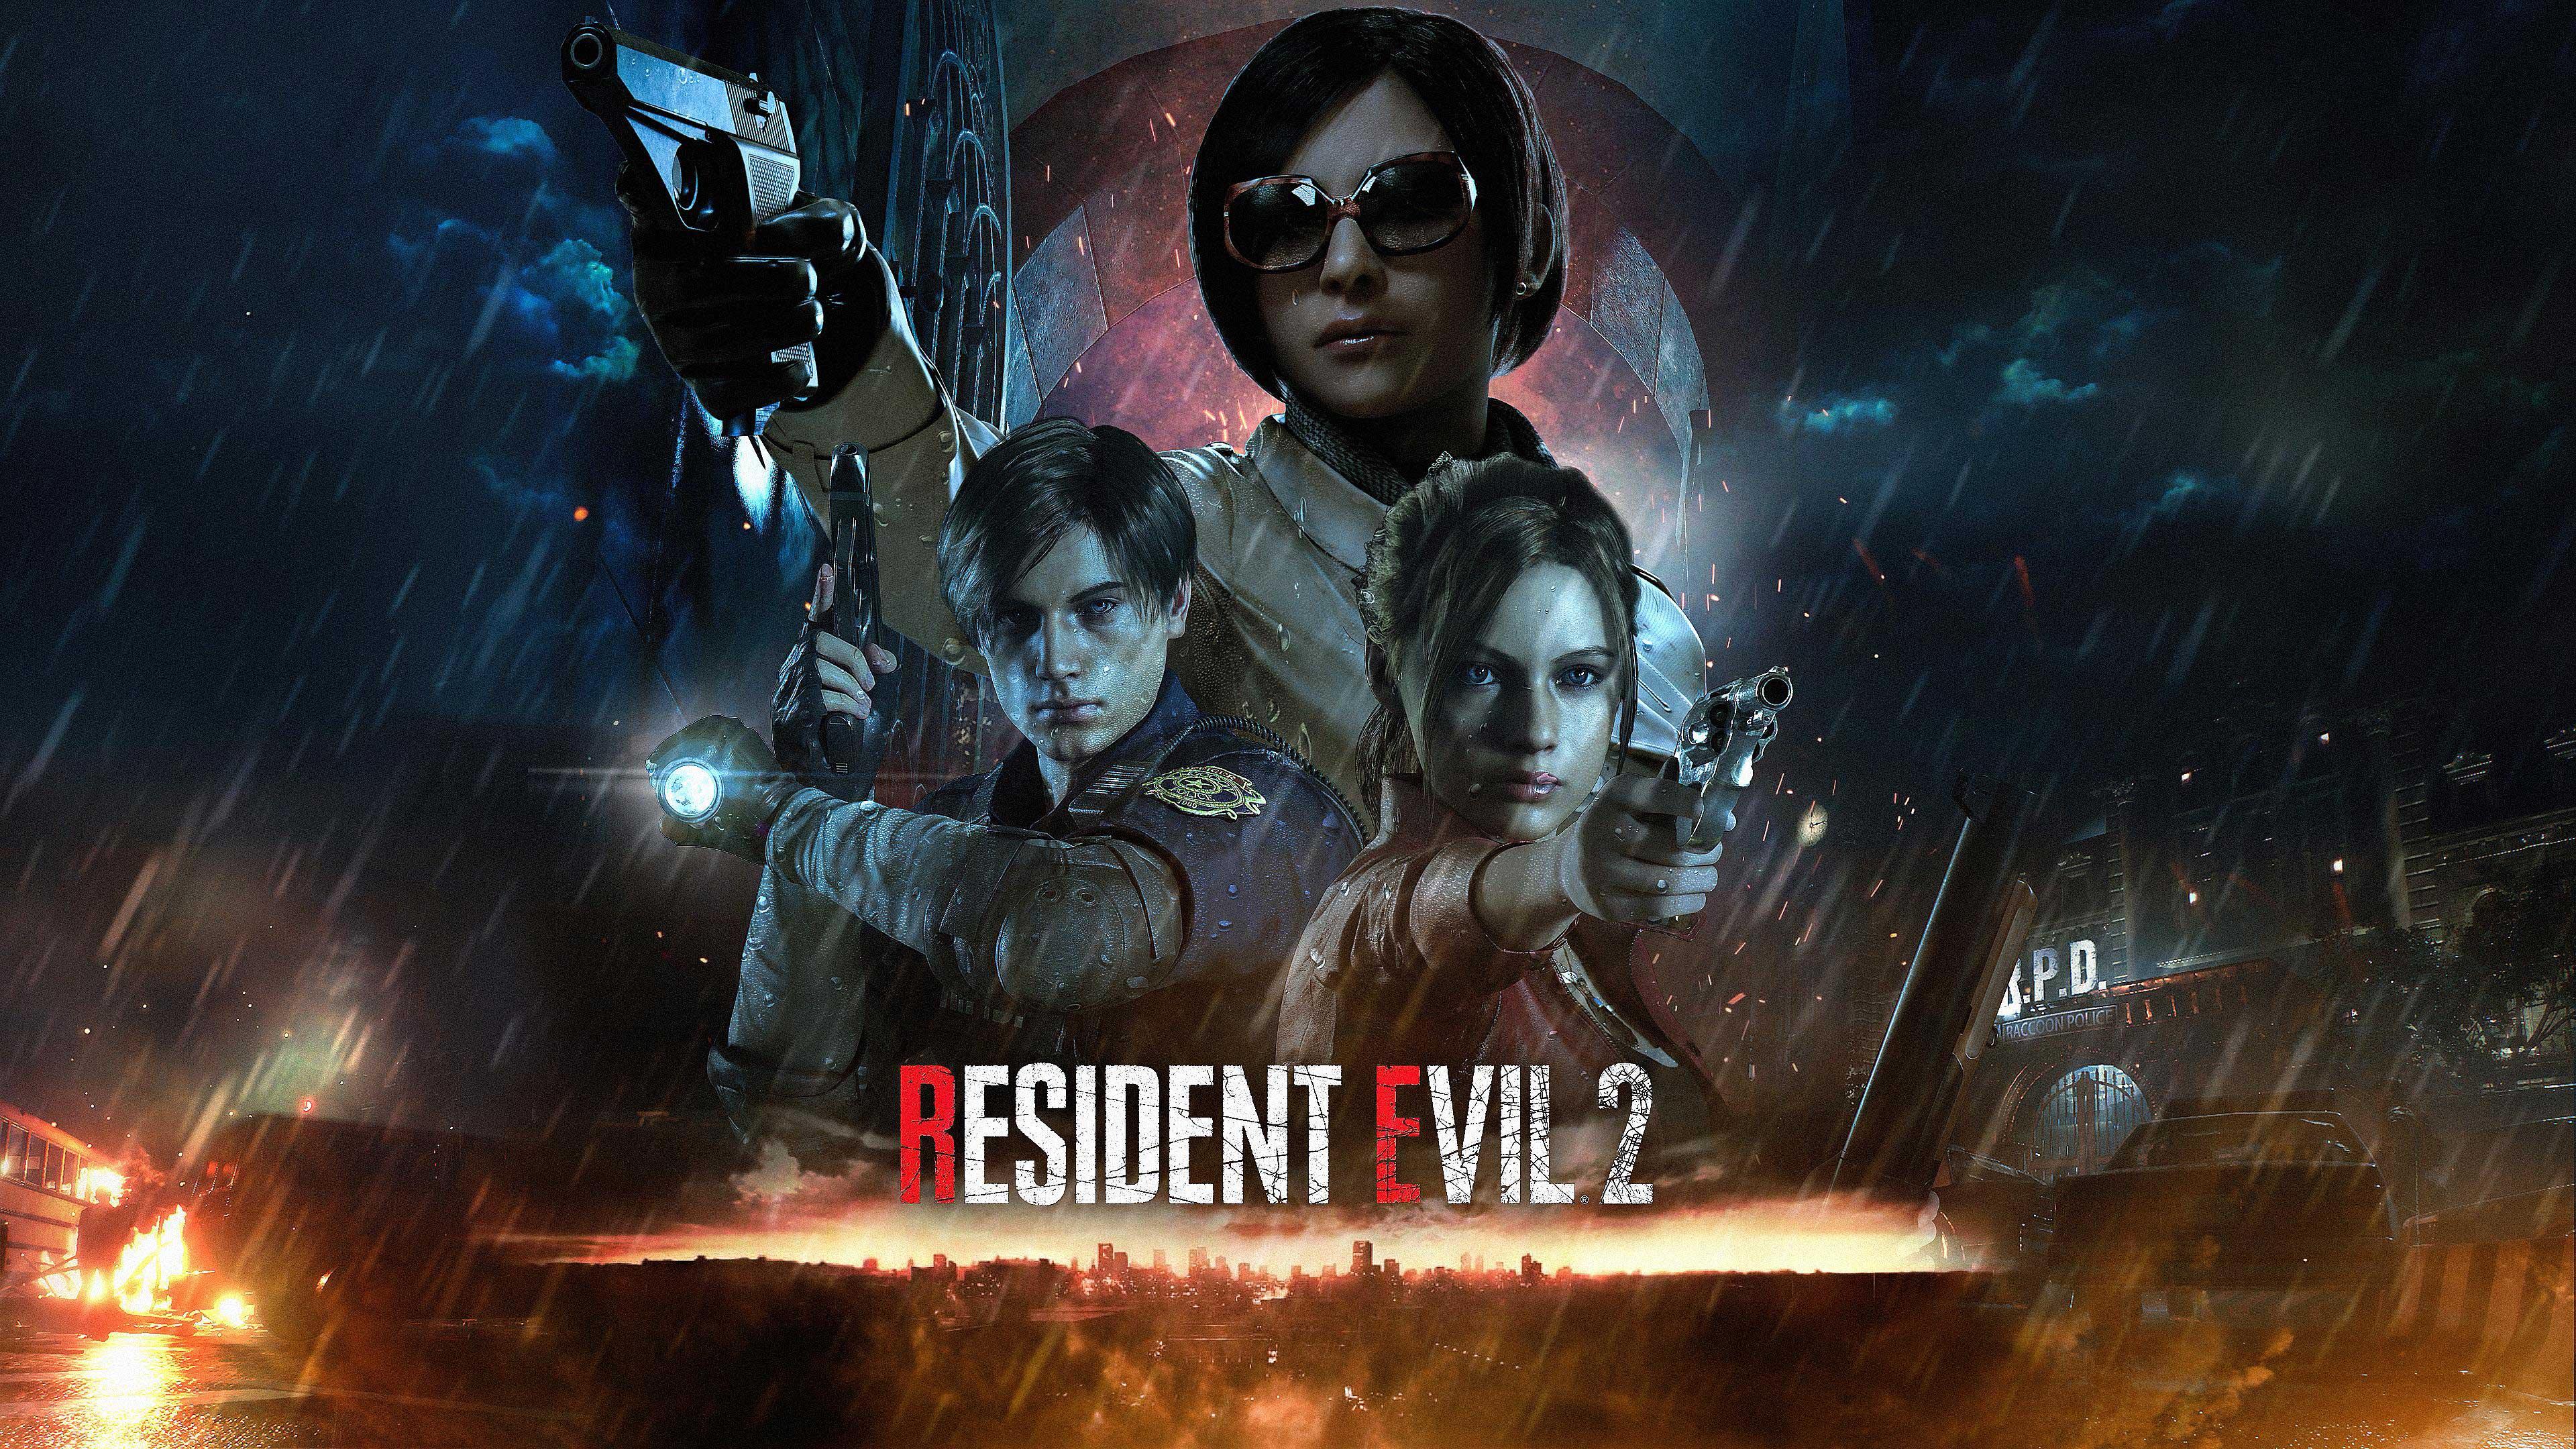 Resident Evil 2 Remake Wallpapers In Ultra HD 4K Gameranx